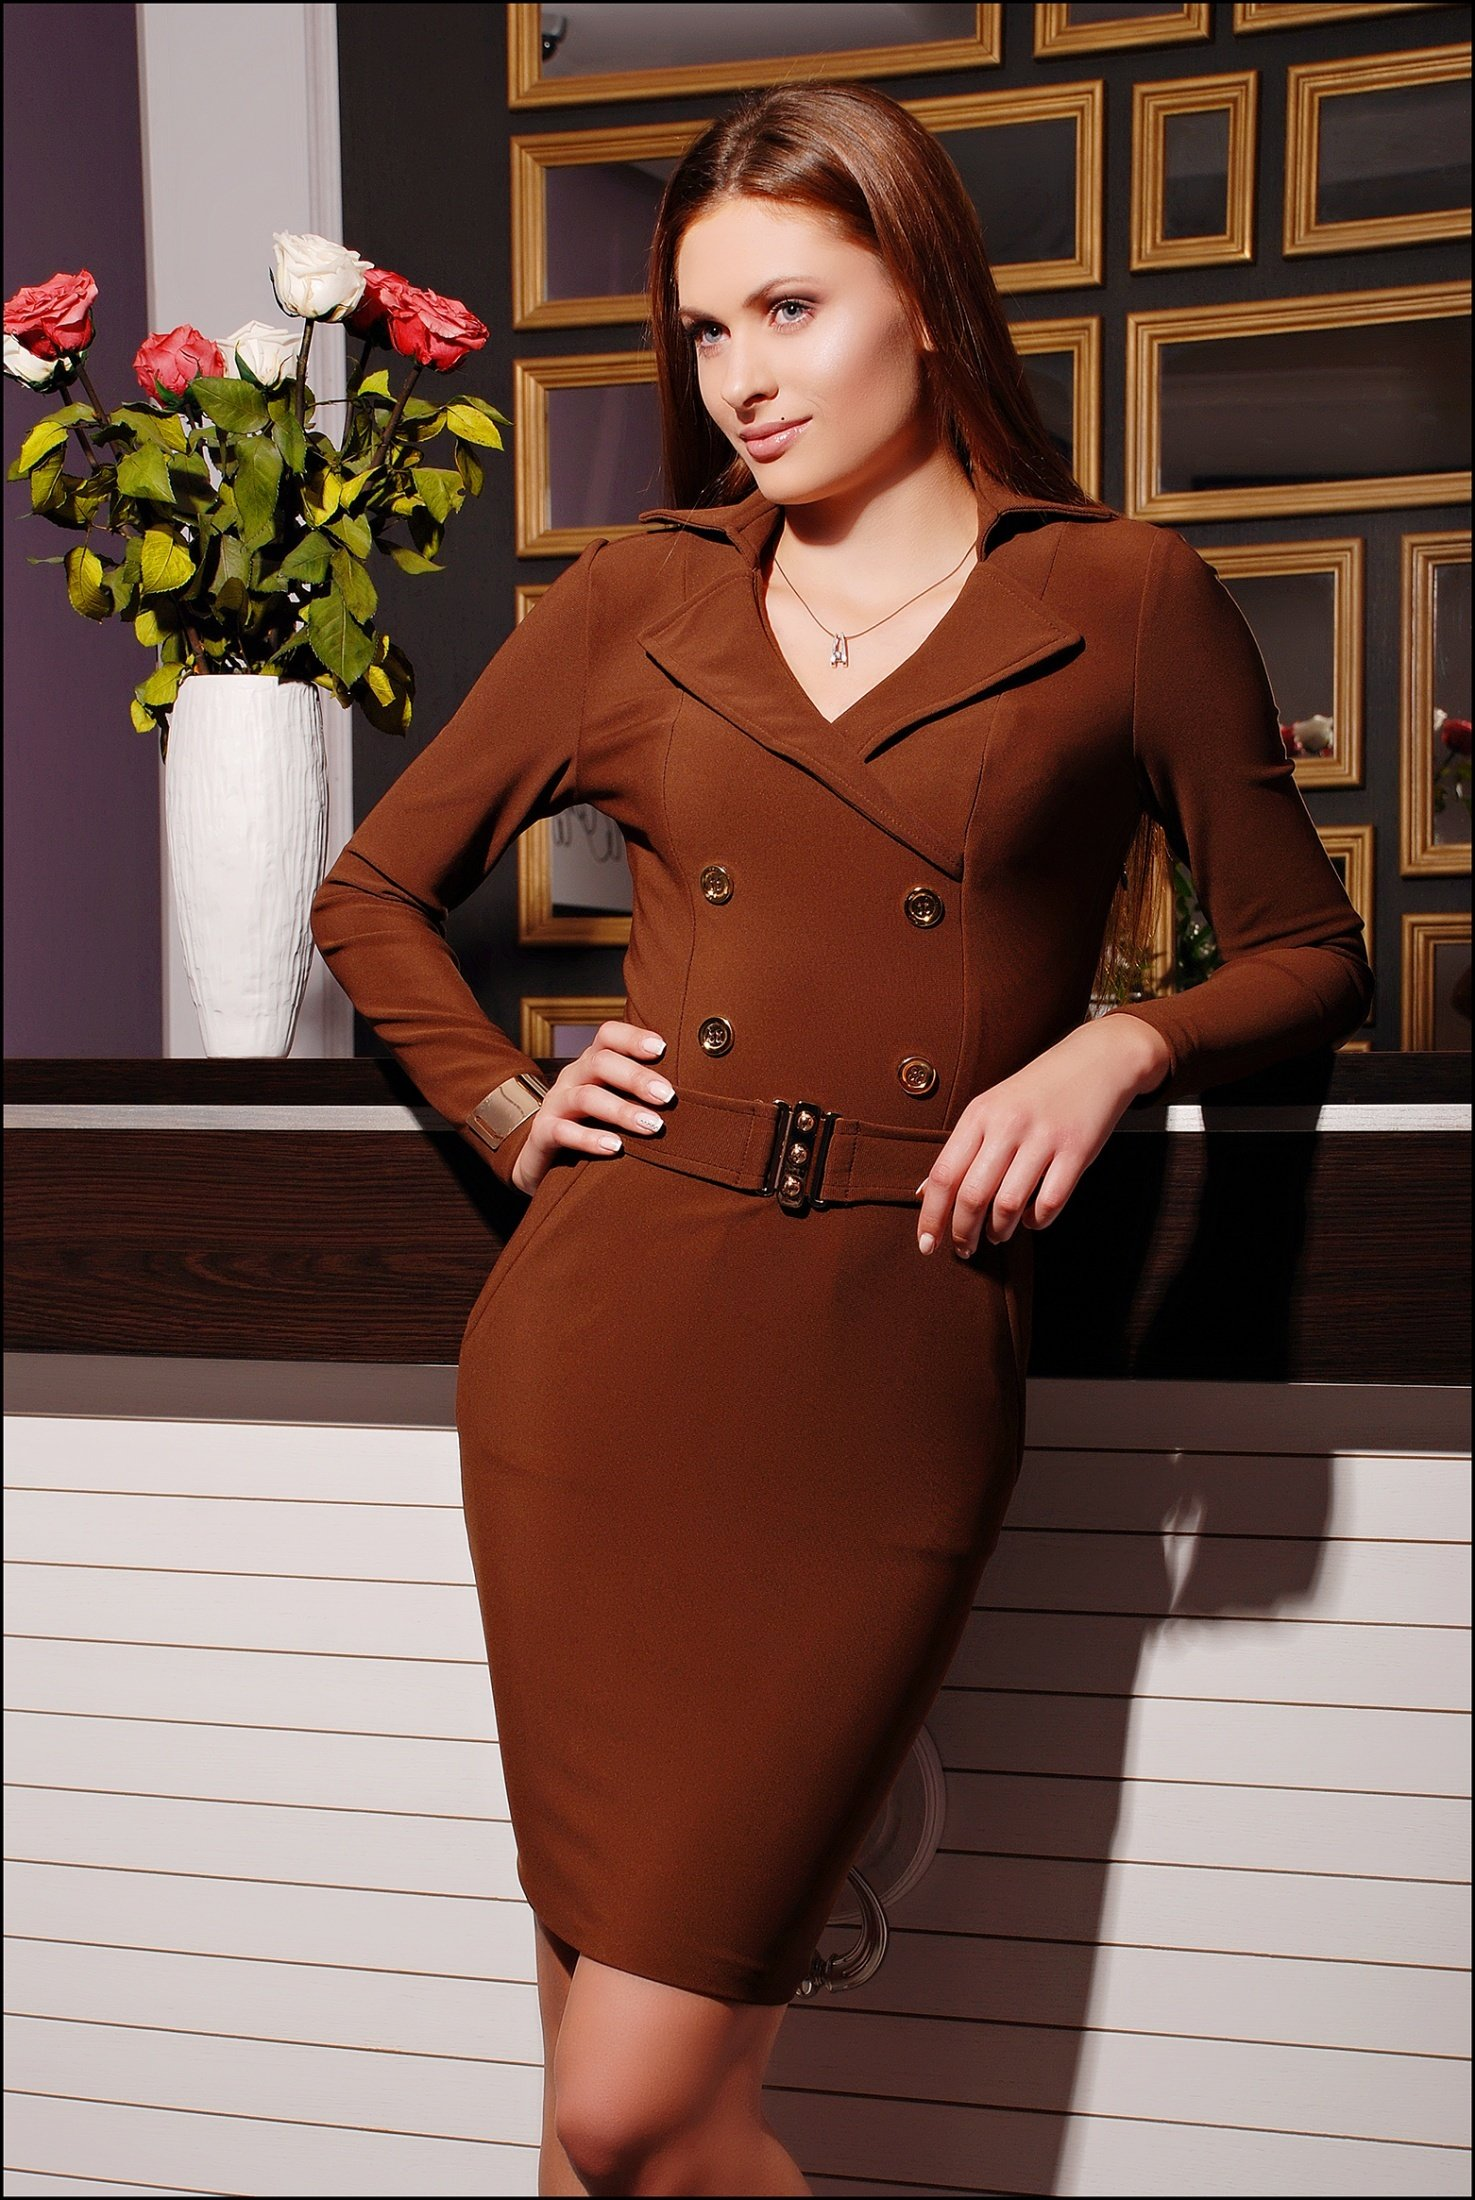 Класичне жіноче коричневе плаття Євро - купити недорого — Donna ... 21cfecc940a0f